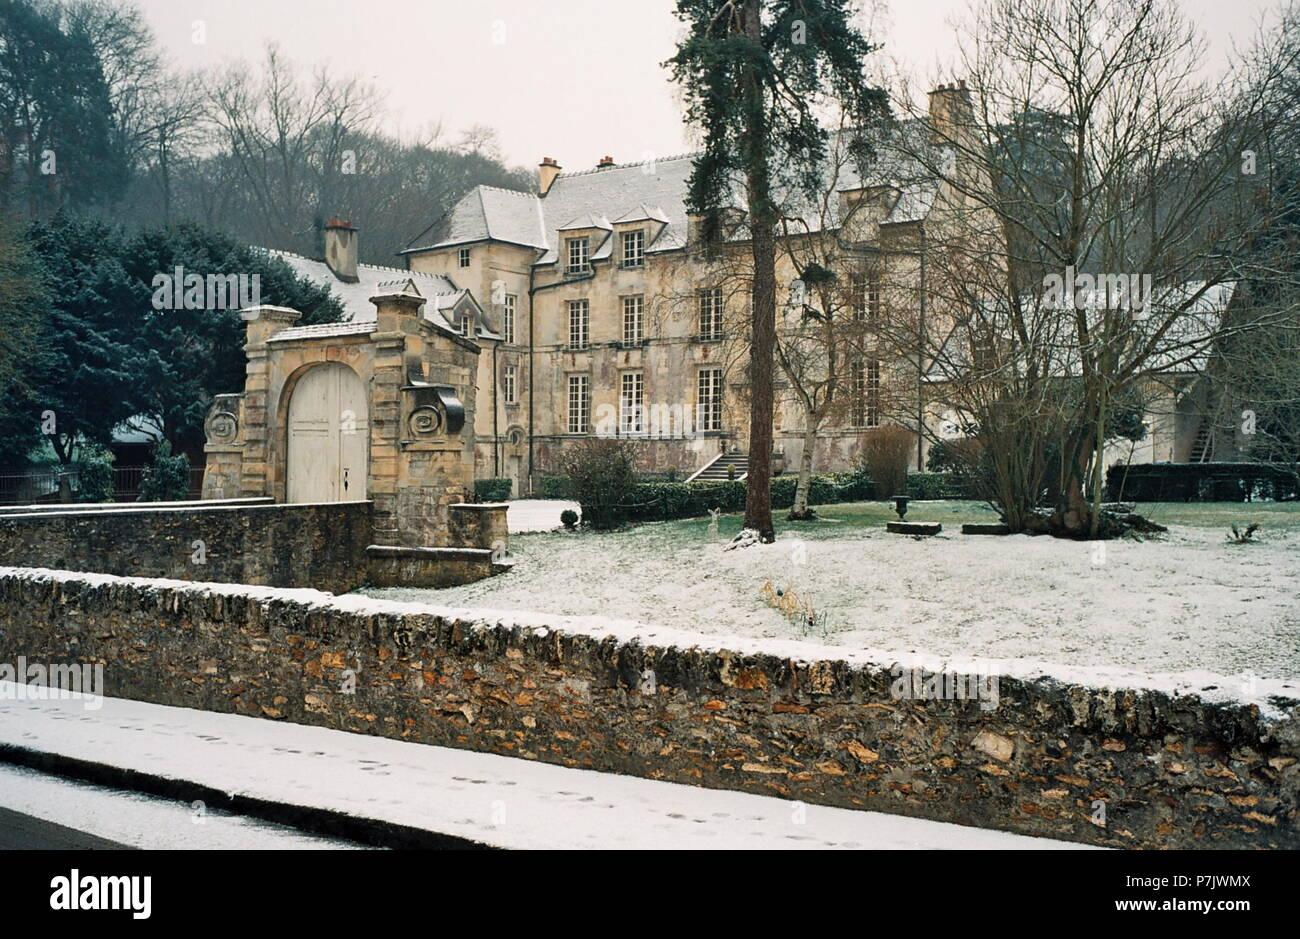 AJAXNETPHOTO. JANUARY, 2009.- LOUVECIENNES,FRANCE. SCENE SUBJECT OF A VIEW PAINTED BY JEANNE BAUDOT 1877 - 1957 - 'LE CHATEAU DU PONT EN HIVER, EFFET DE NEIGE, 1948.' THE BRIDGE HOUSE IN WINTER, EFFECT OF SNOW. PHOTO:JONATHAN EASTLAND/AJAX REF:TC2587 29 28A Stock Photo